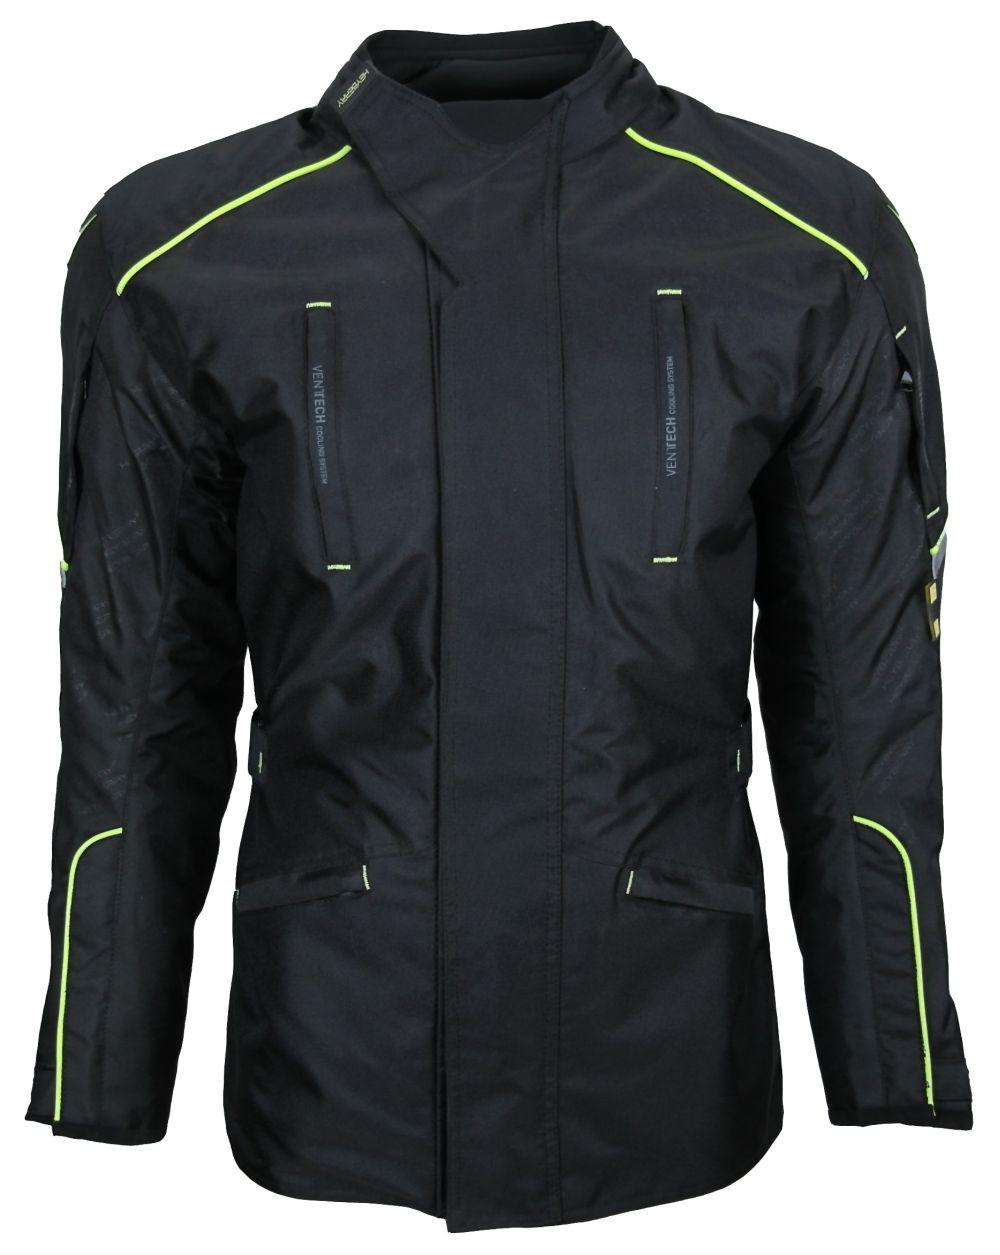 Heyberry Textil Touren Motorradjacke Motorrad Jacke schwarz neon Gr. M-3XL